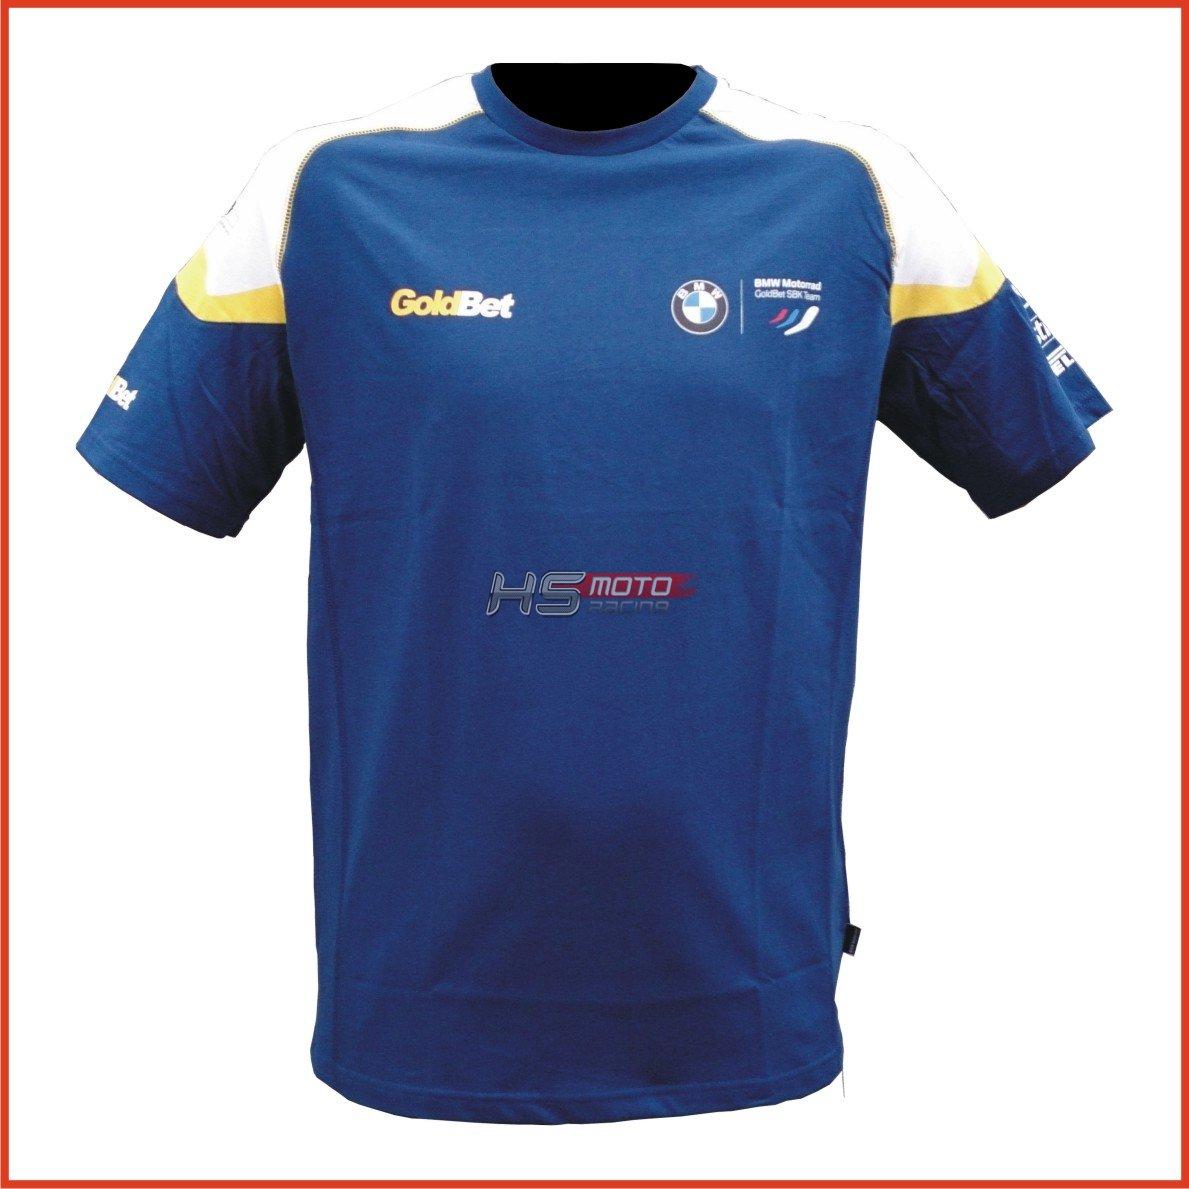 Bmw Motorsport Goldbet T Shirt Male